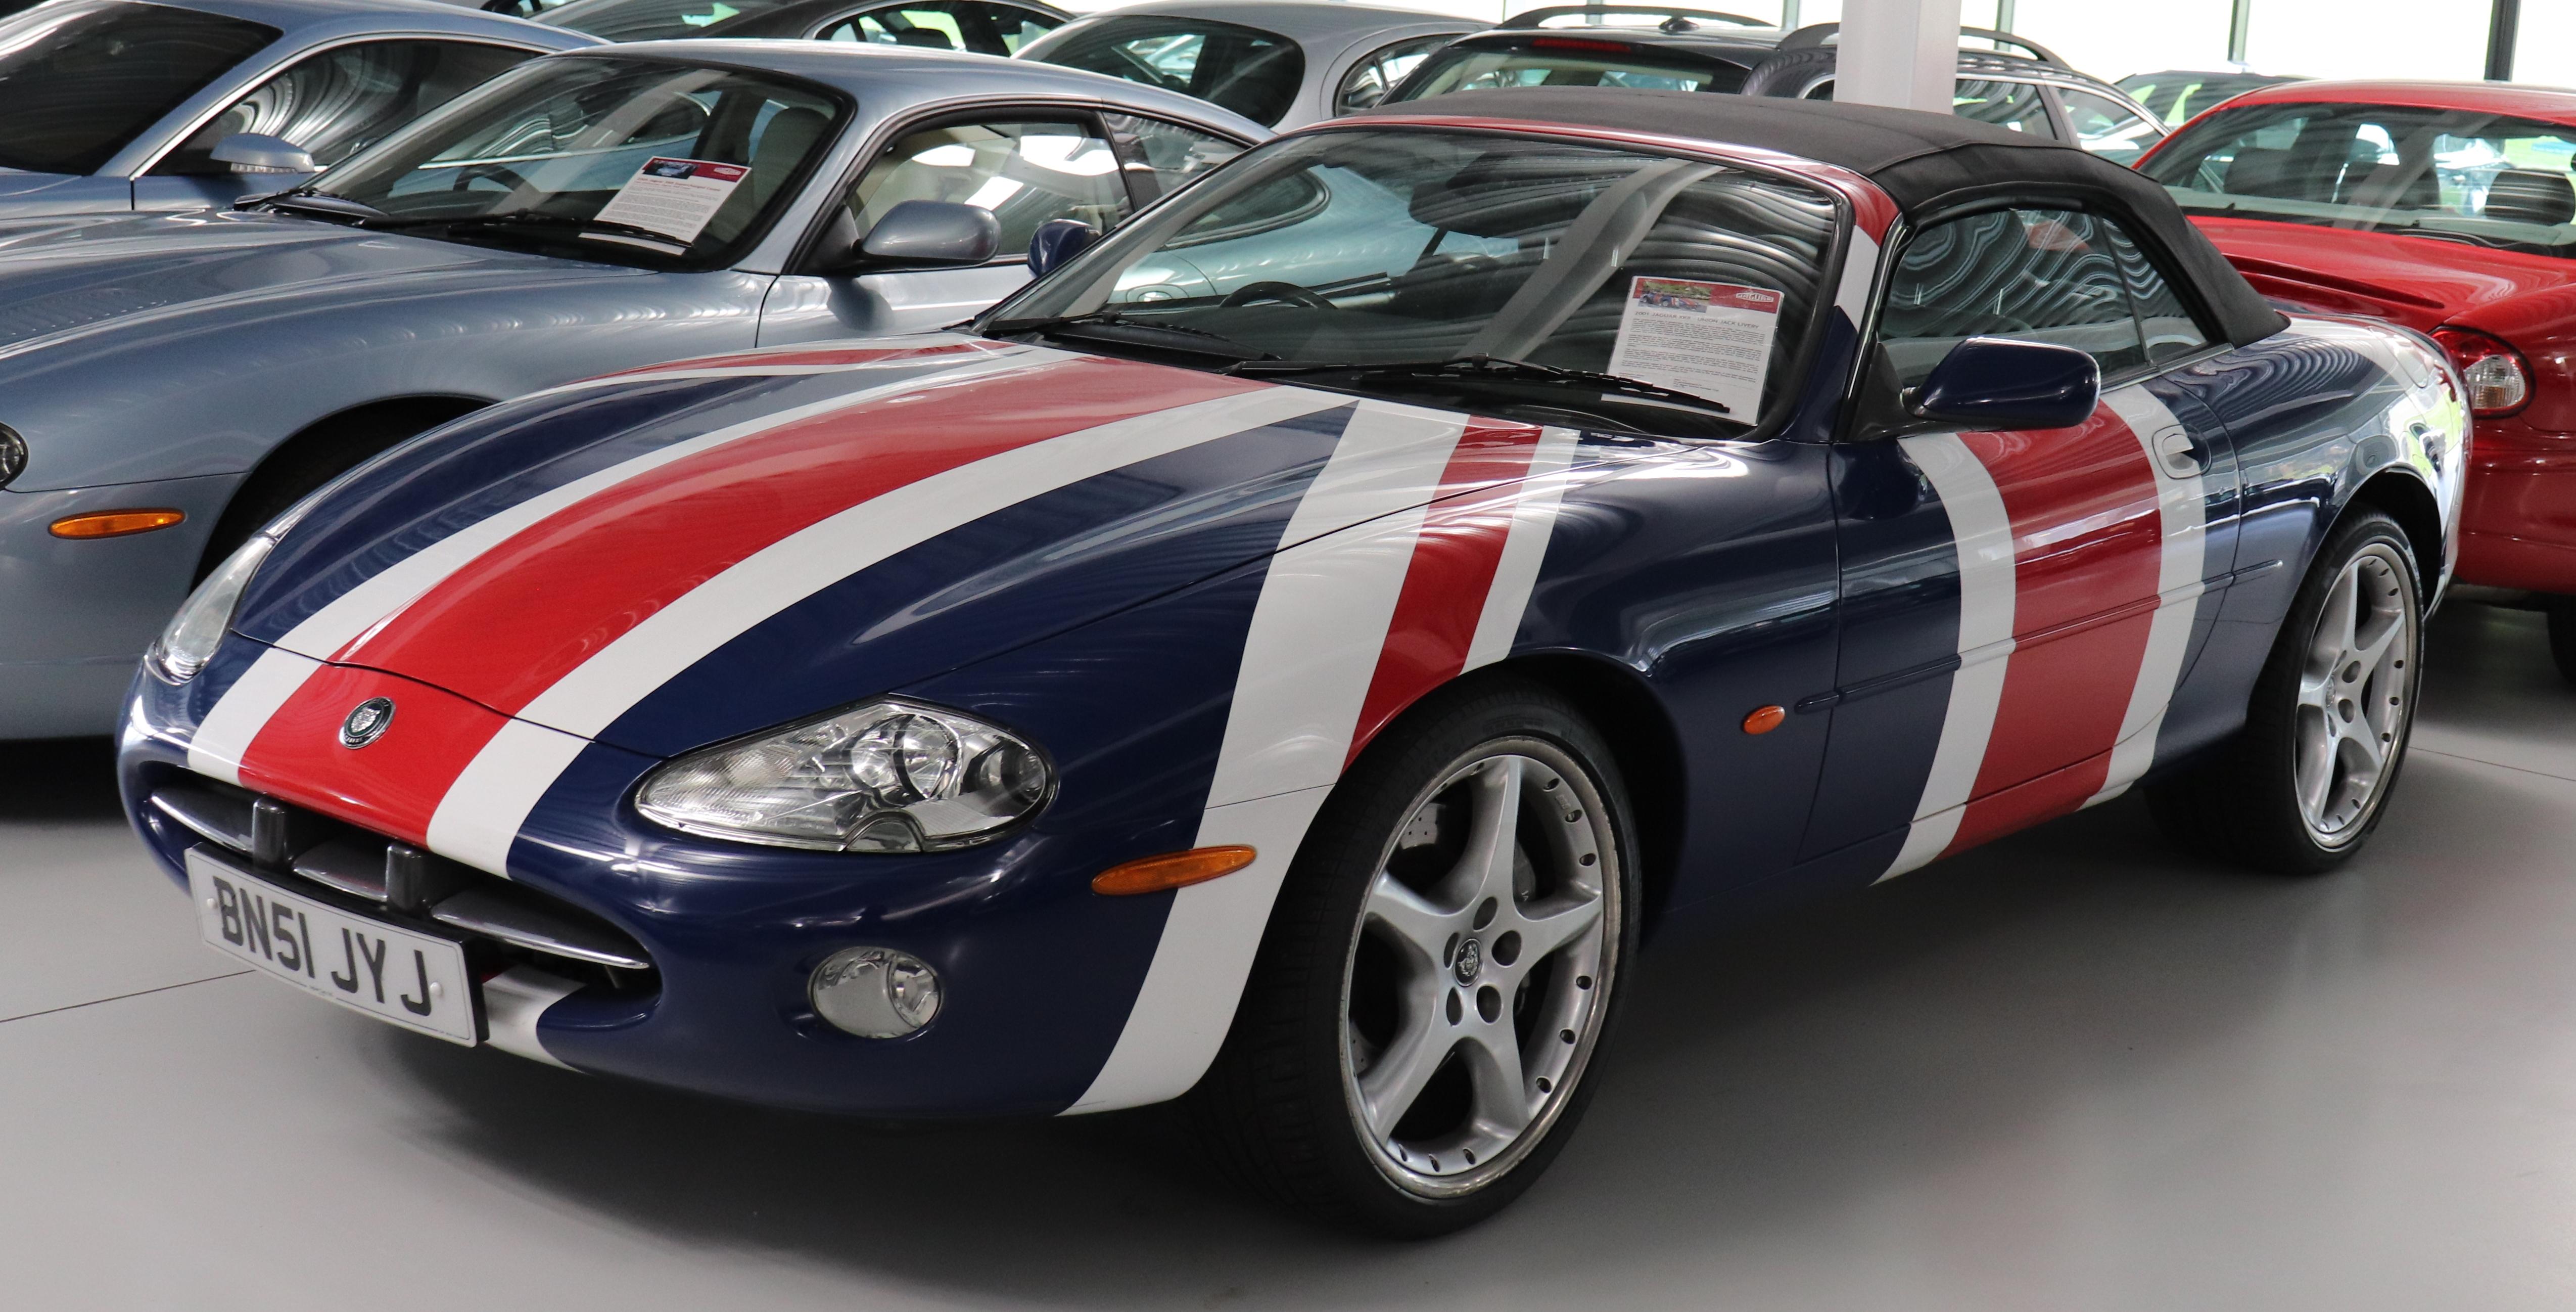 File:2001 Jaguar XK8 (Union Jack Livery) 4 2 jpg - Wikimedia